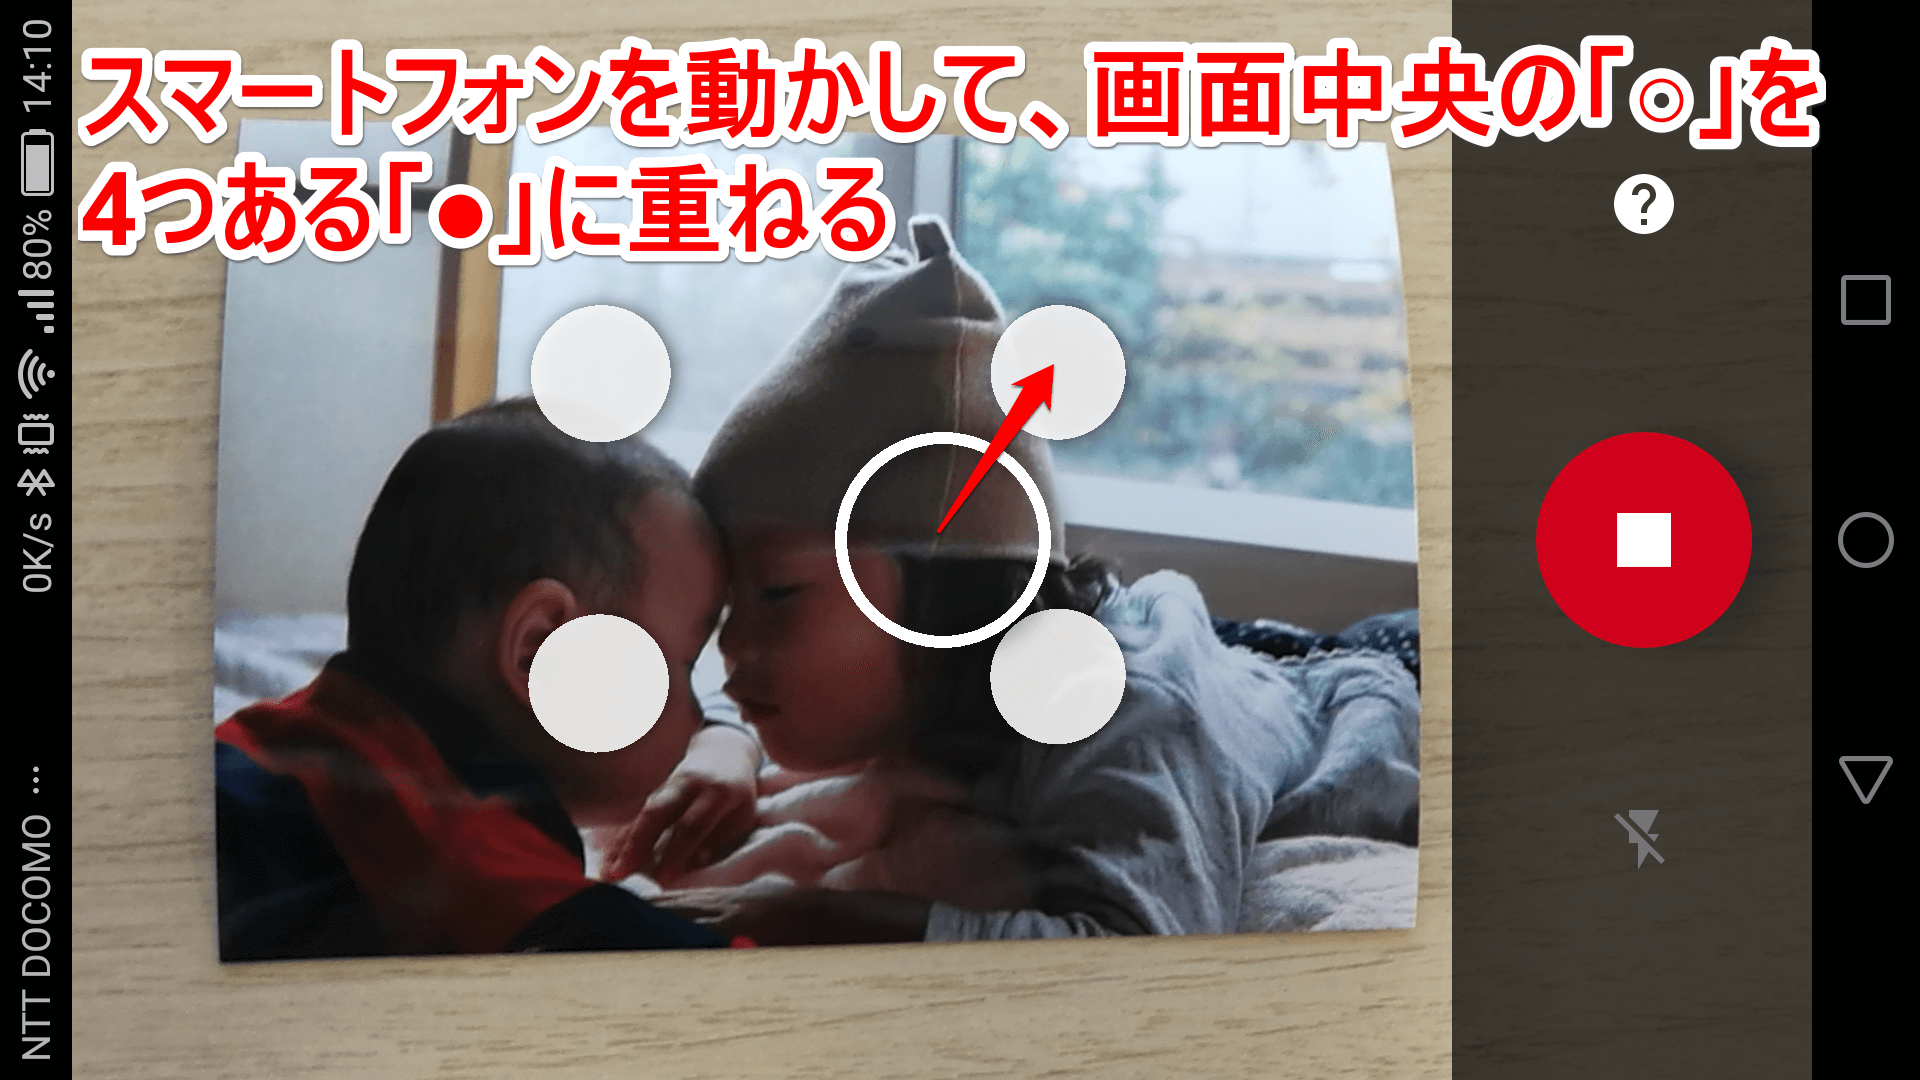 Google Photo[フォトスキャン]アプリの取り込み画面